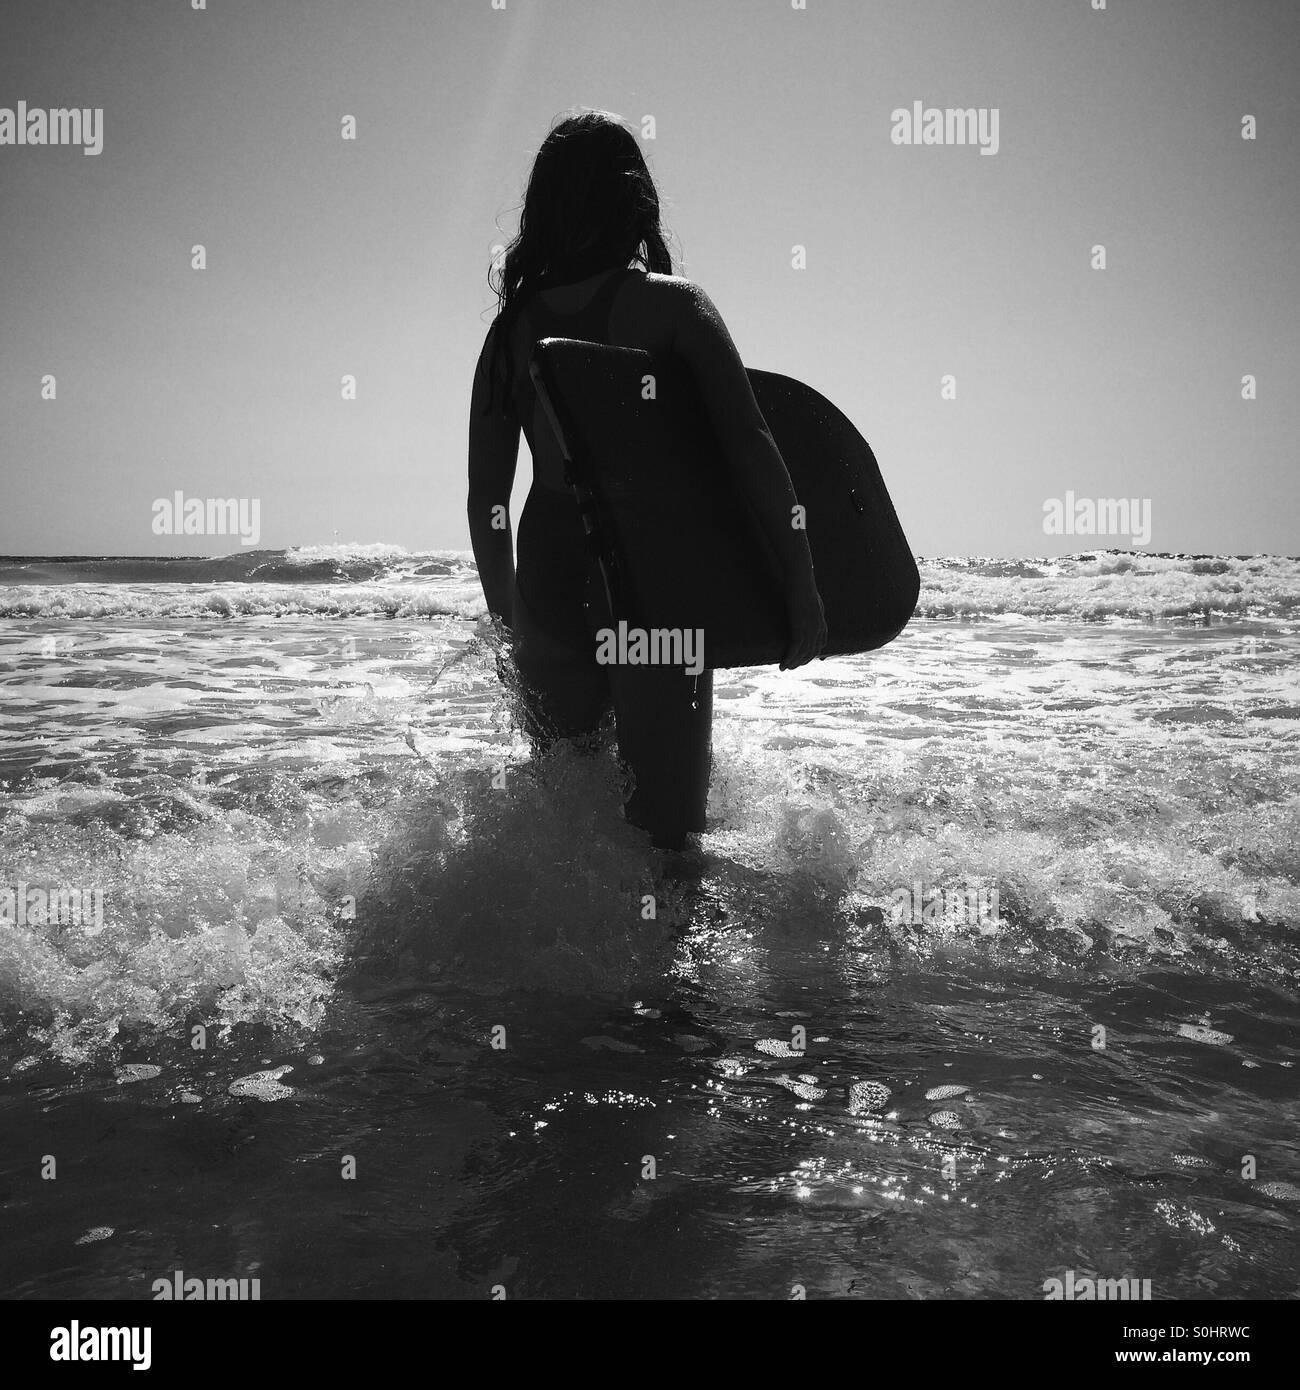 Girl about to go boogie boarding, Falasarna beach, Crete, Greece - Stock Image